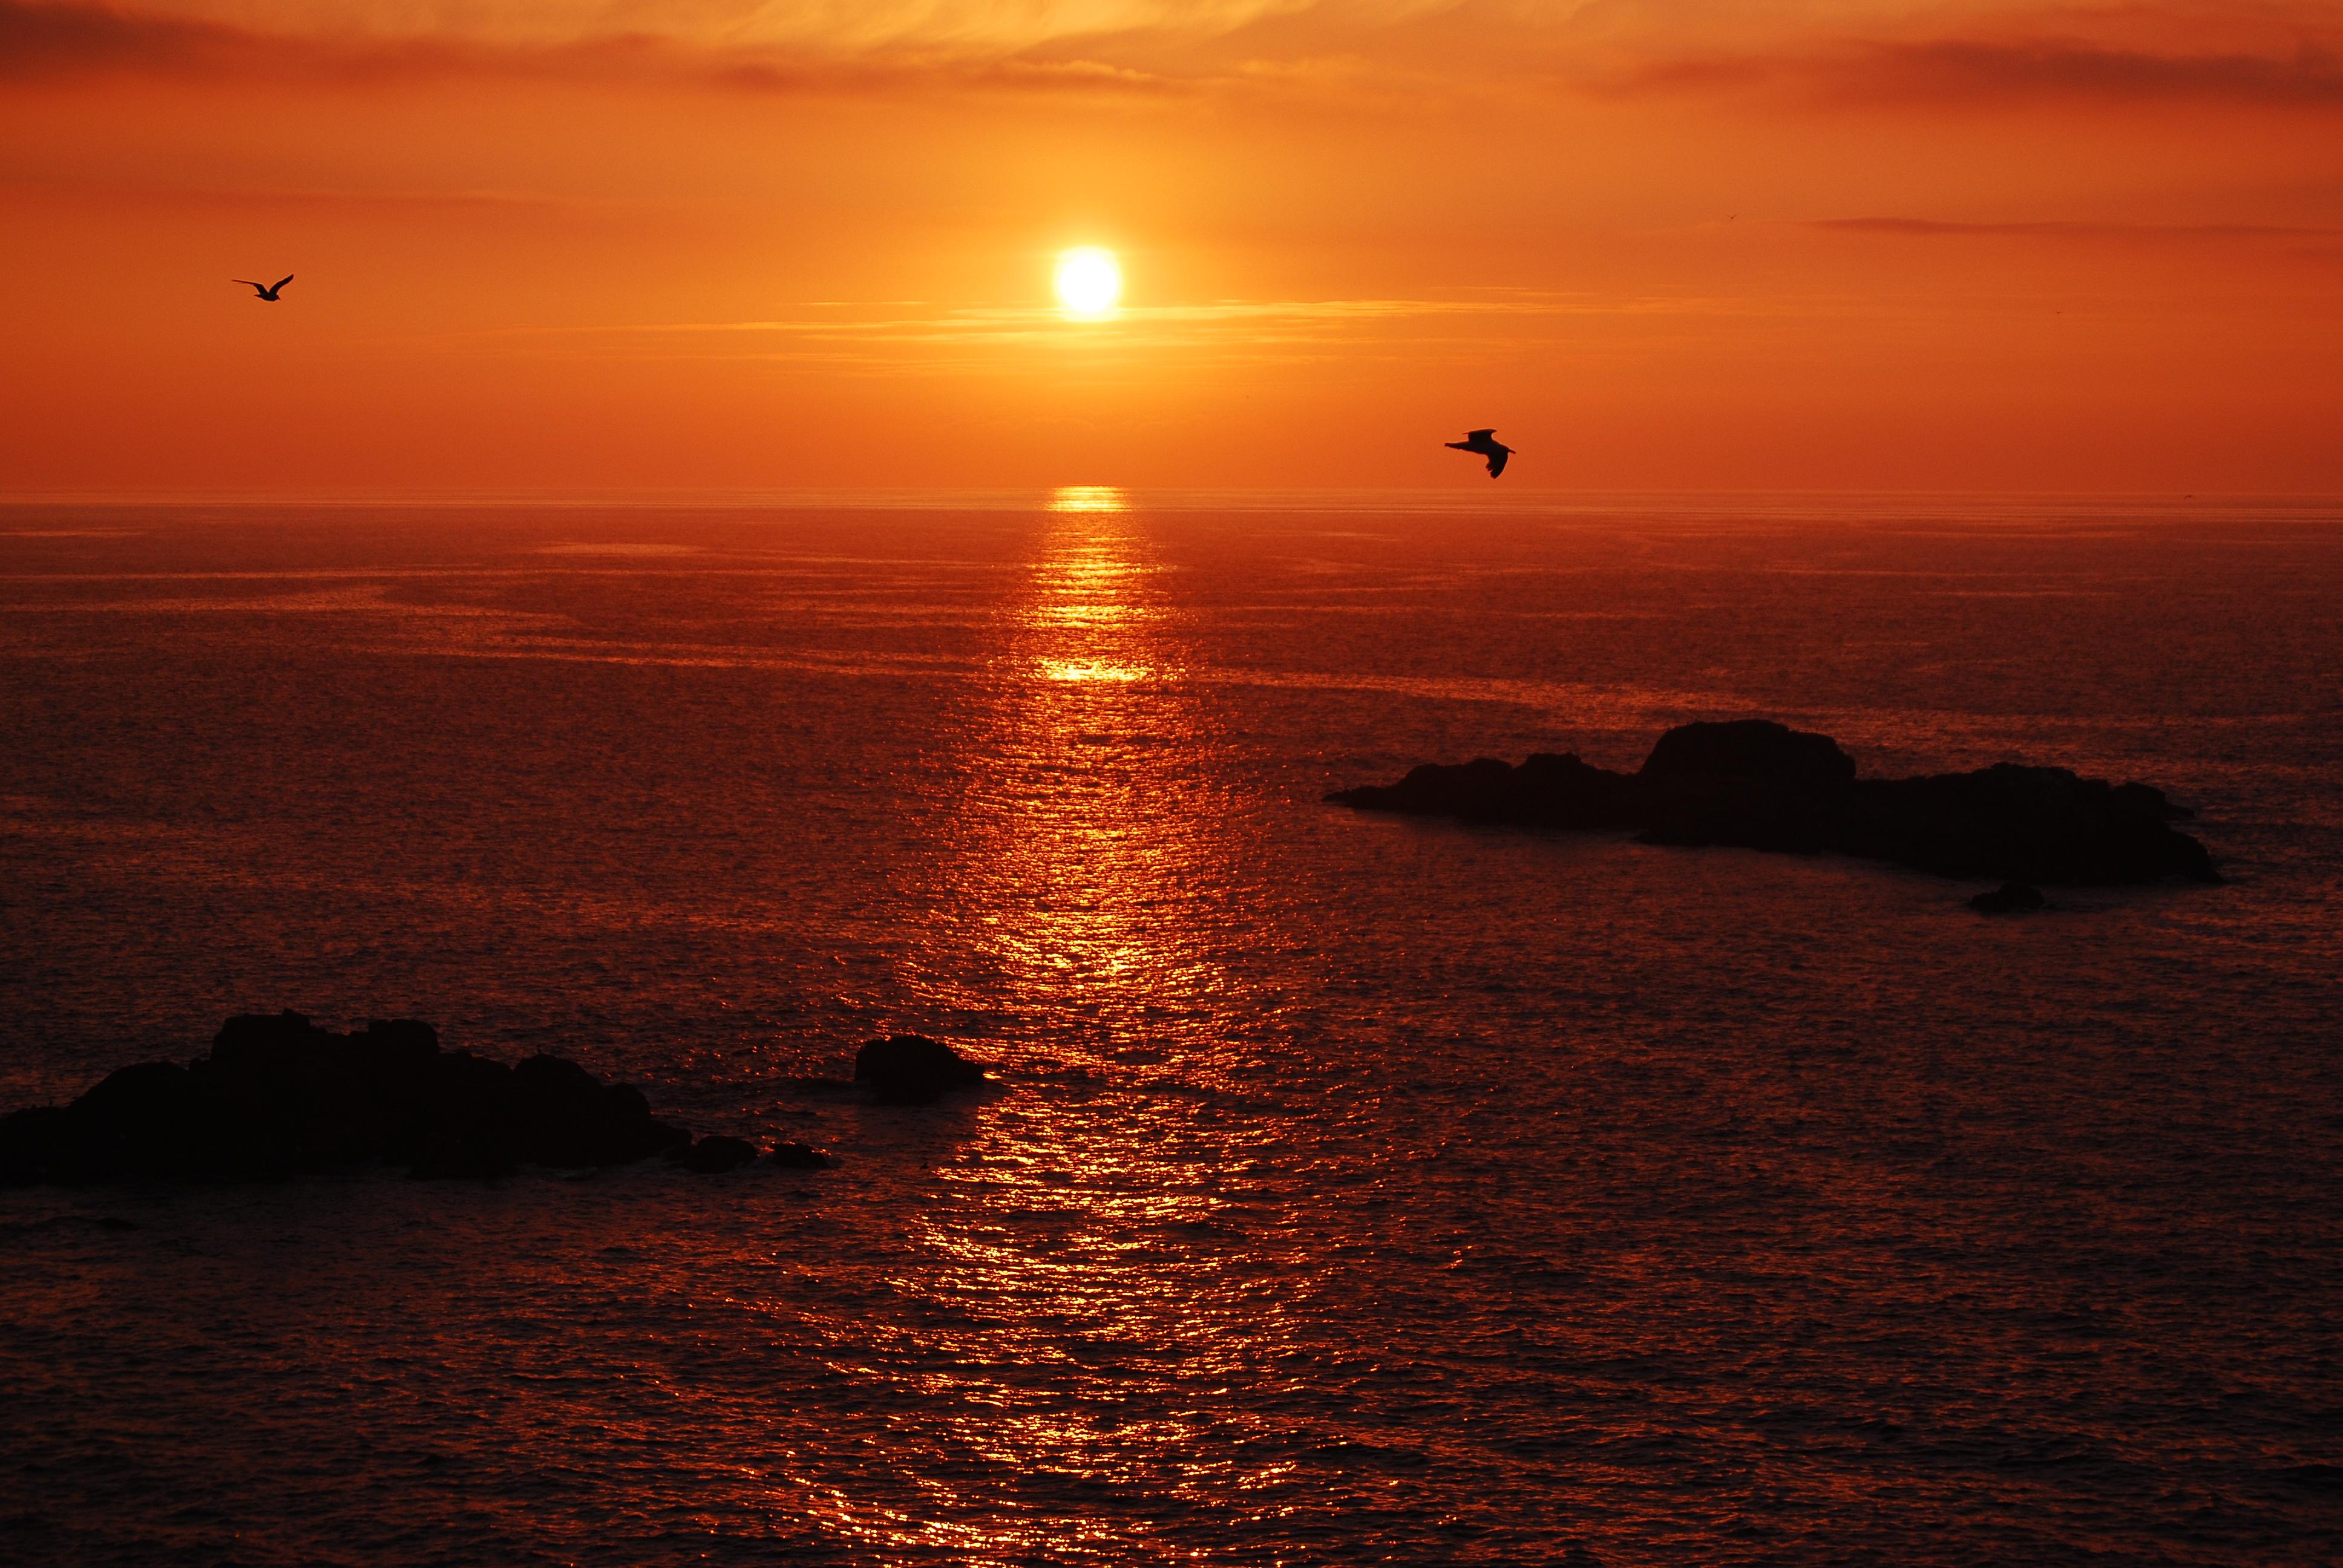 Sunset 4k Ultra Hd Wallpaper Background Image 3872x2592 Id